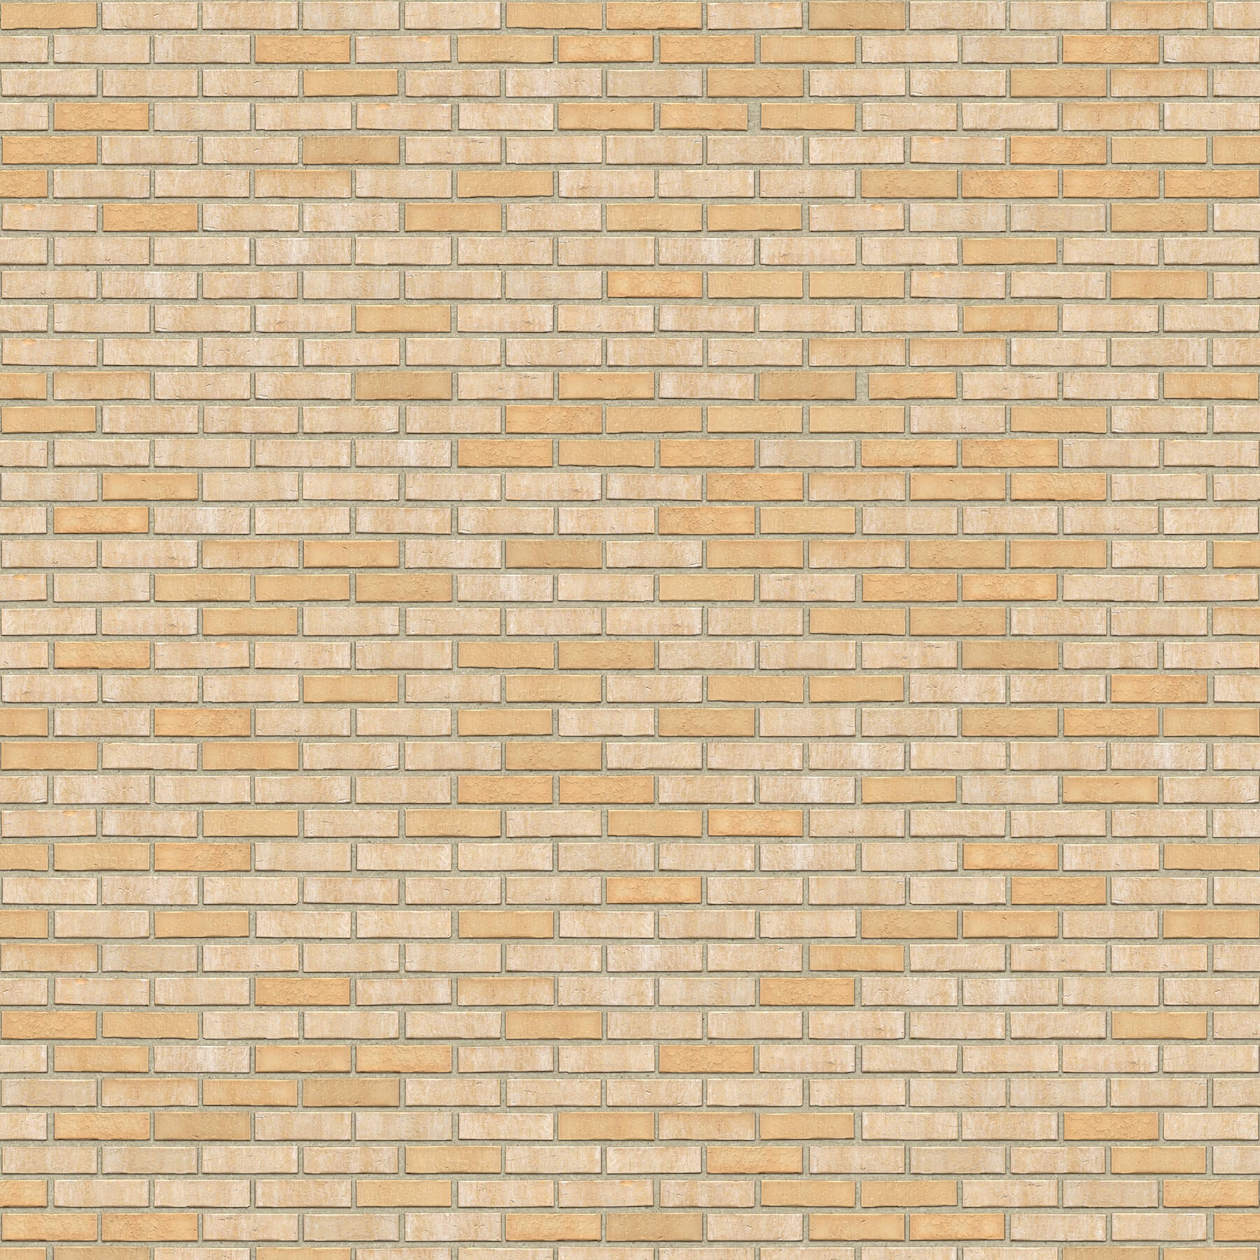 Puna-cigla-FeldHaus-Klinker-brick-house-nf-k-741-Bez Fuga